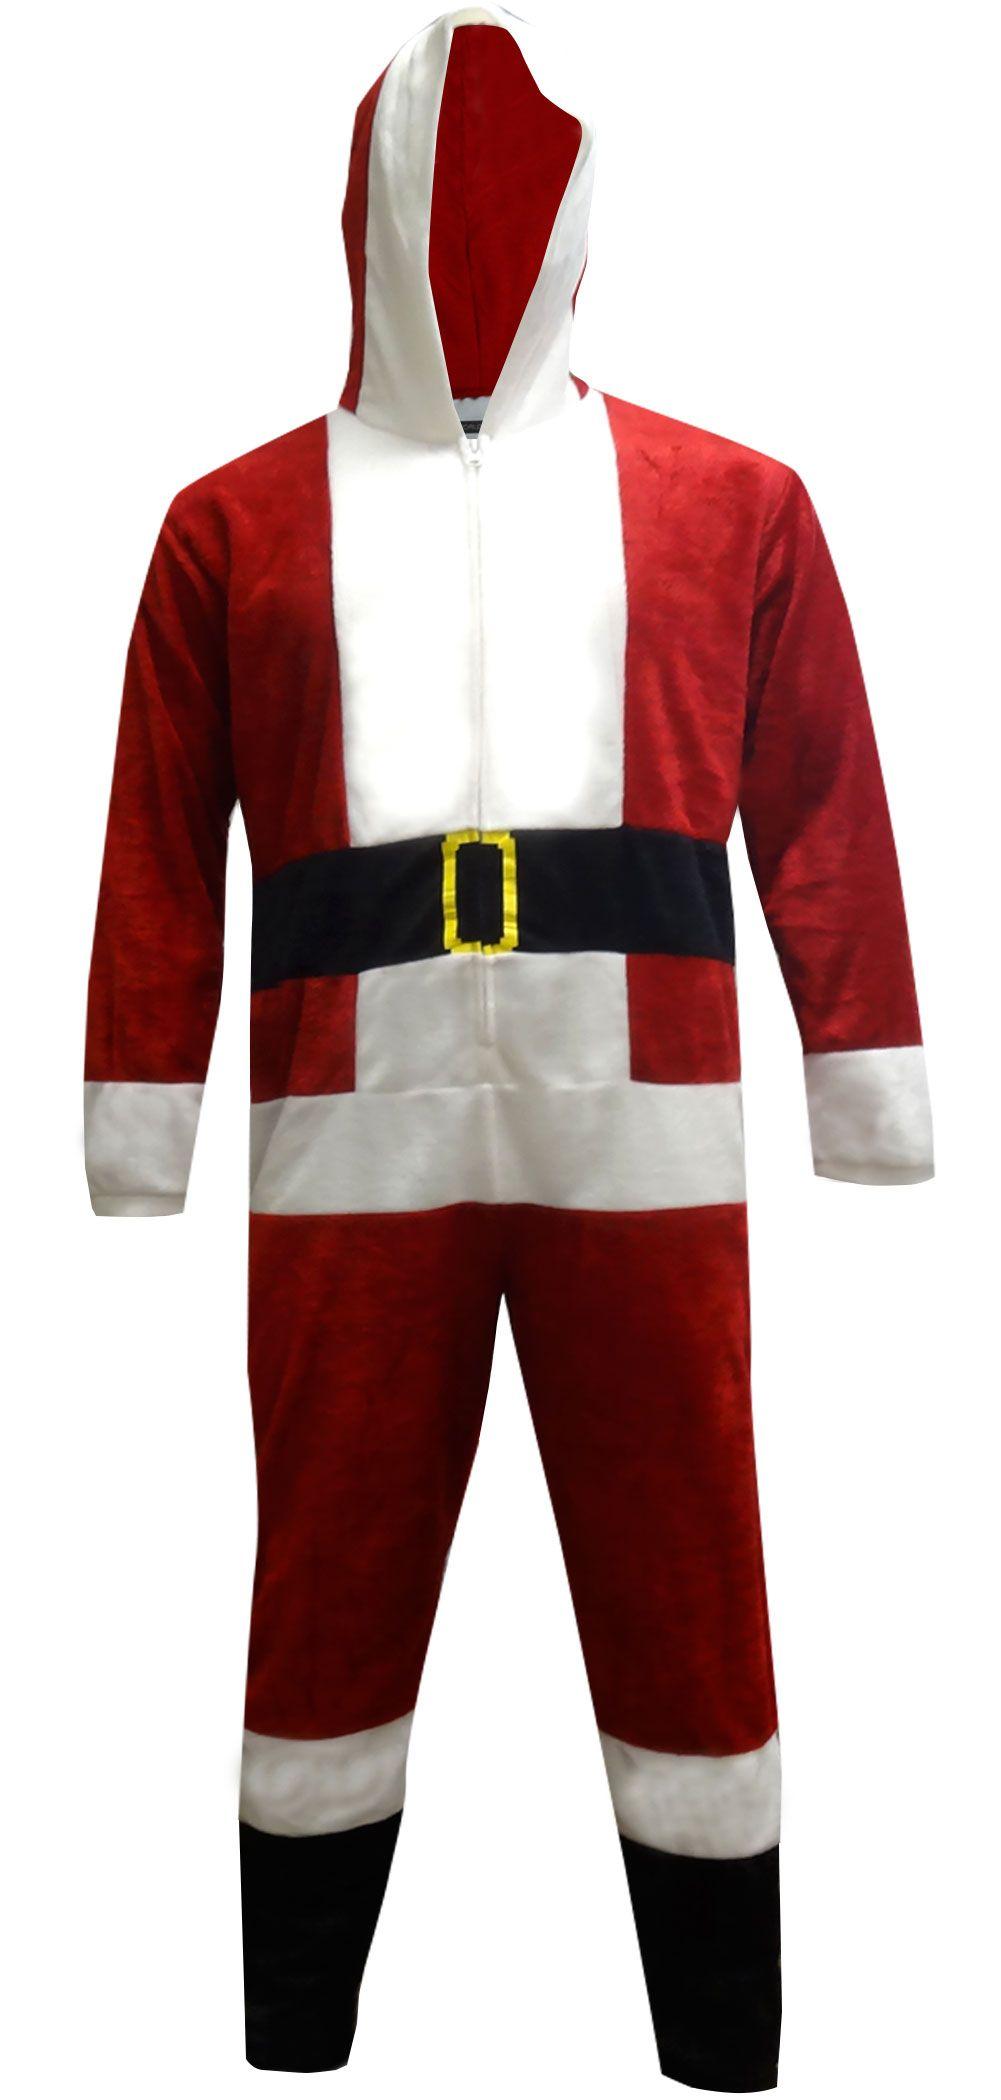 a6651fe5f9c6 WebUndies.com Dress Like Santa Fleece Men s One Piece Hooded Pajama